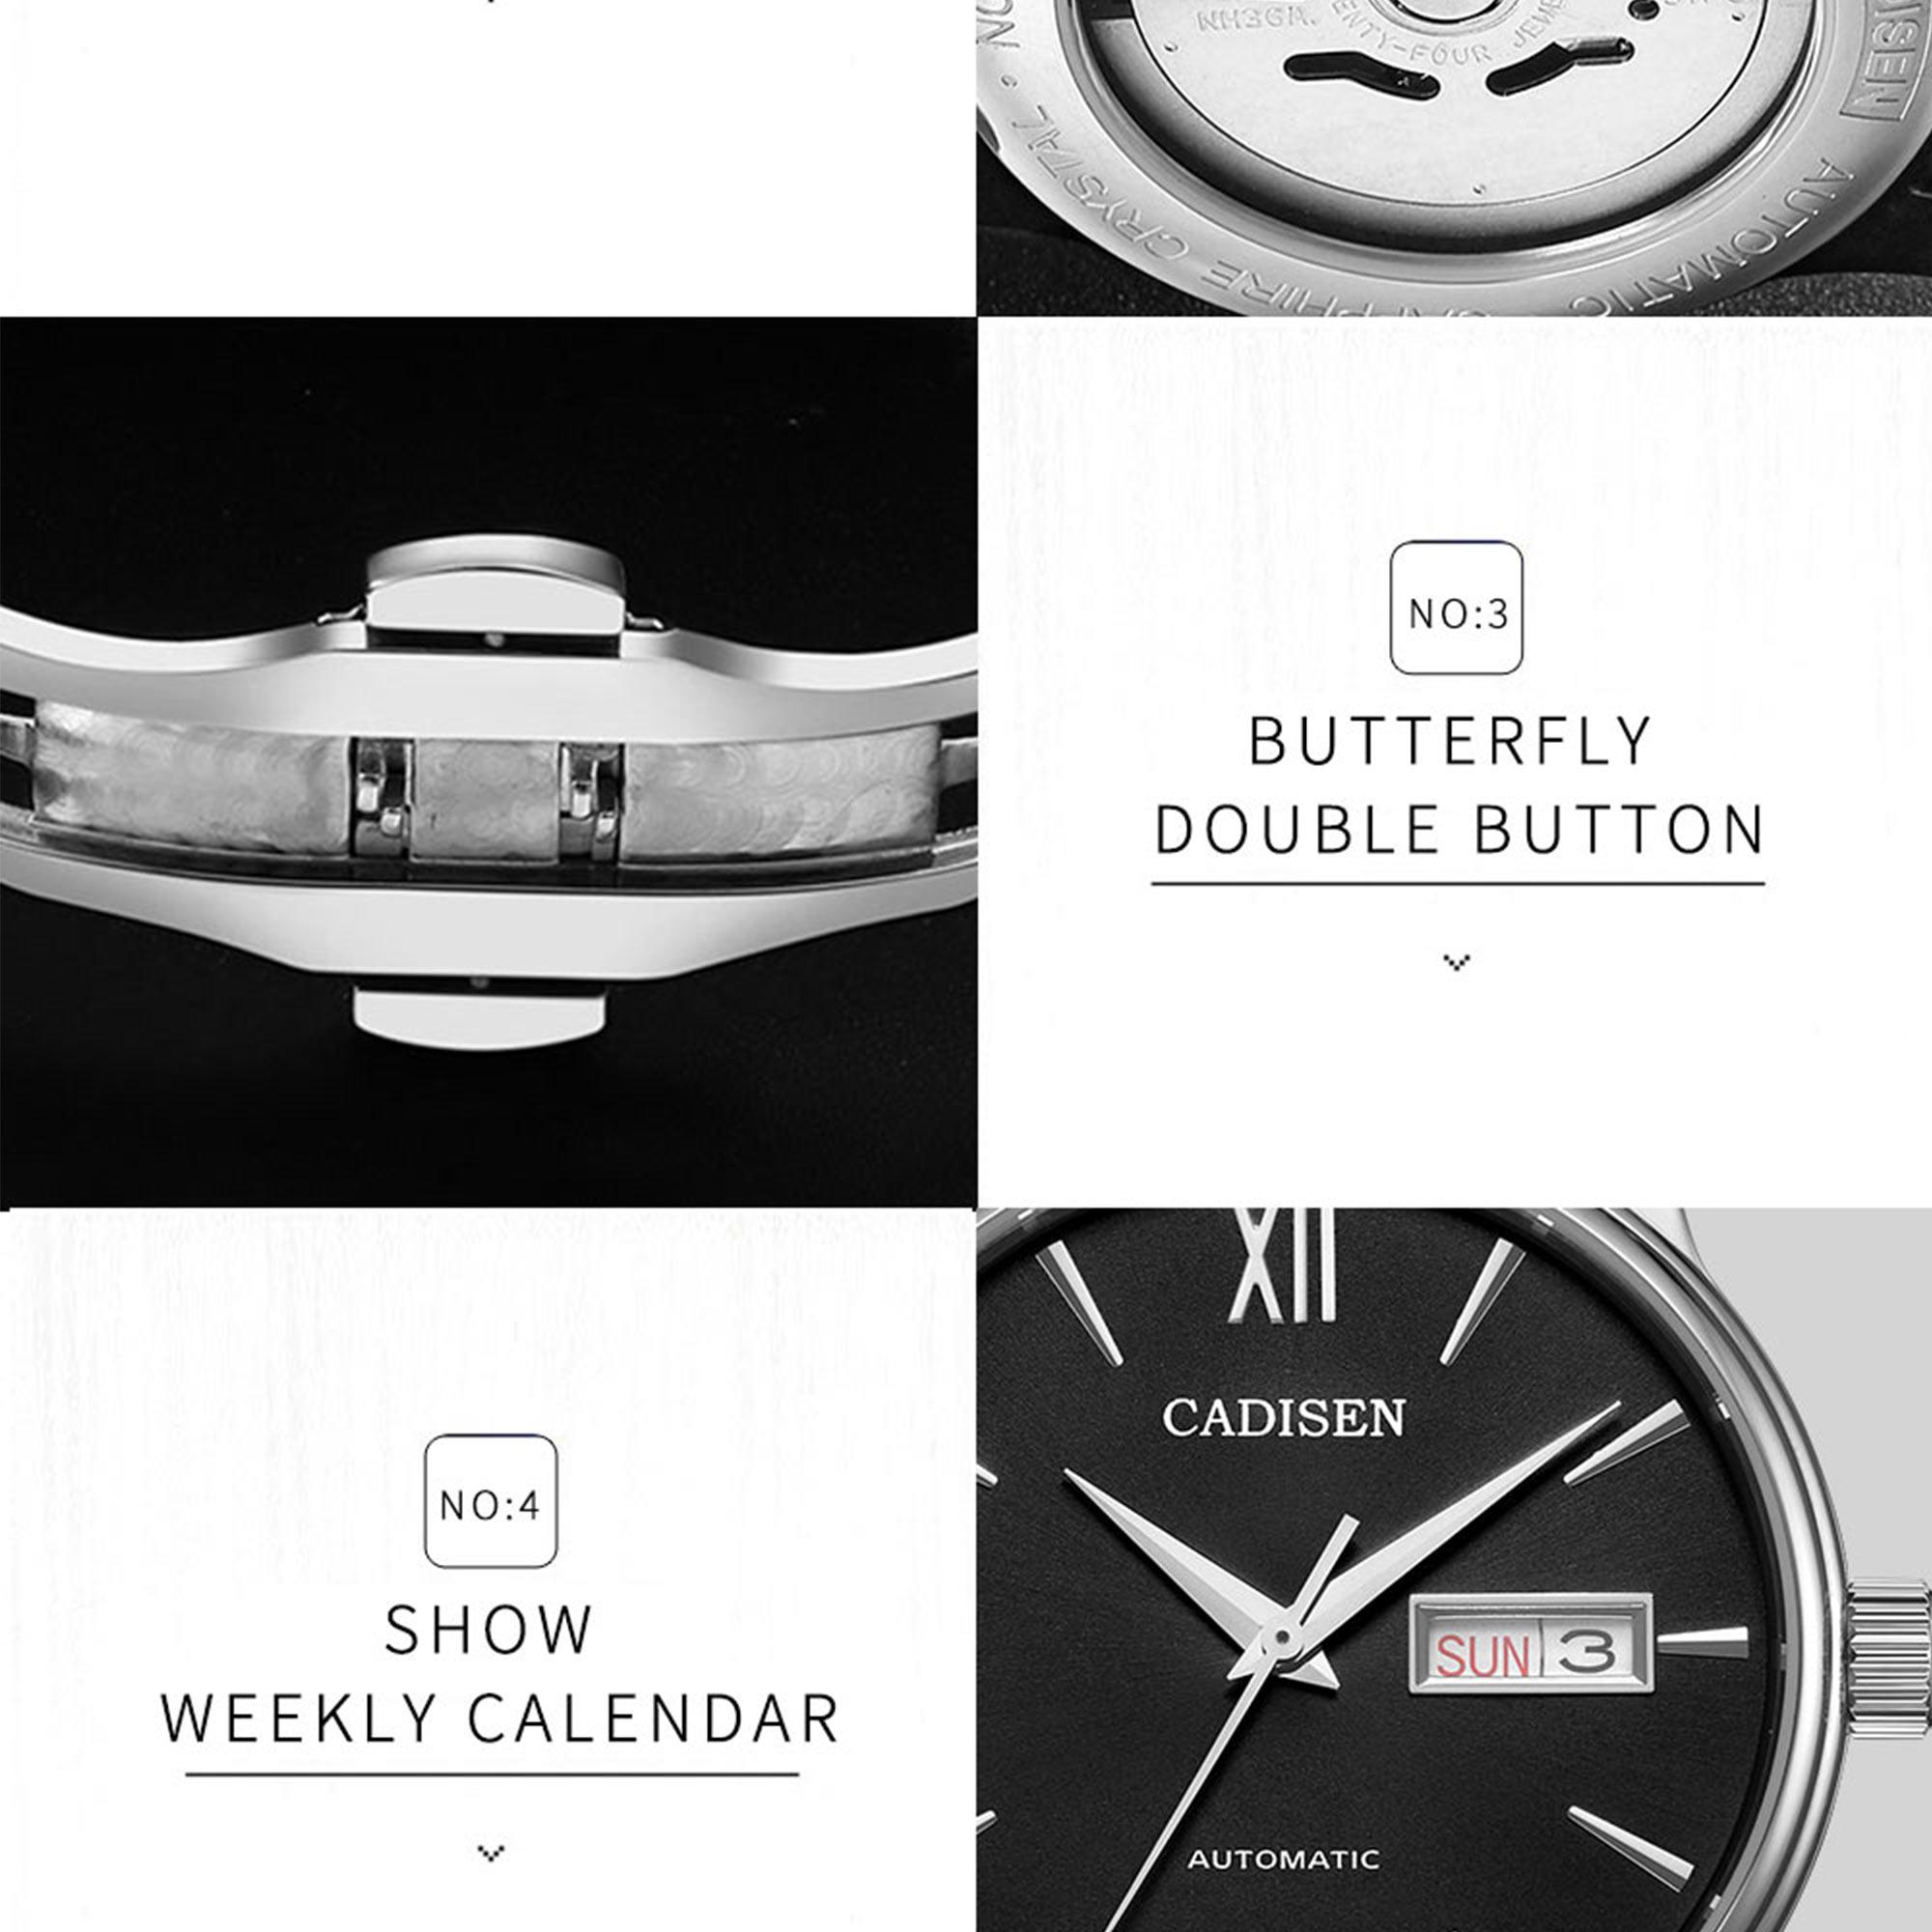 H25490c3716be458cba8bcb600101ce8dO CADISEN Men Watch Automatic Mechanical Watches Role Date Week Top Luxury Brand Japan NH36A Wrist watch Clock Relogio Masculino